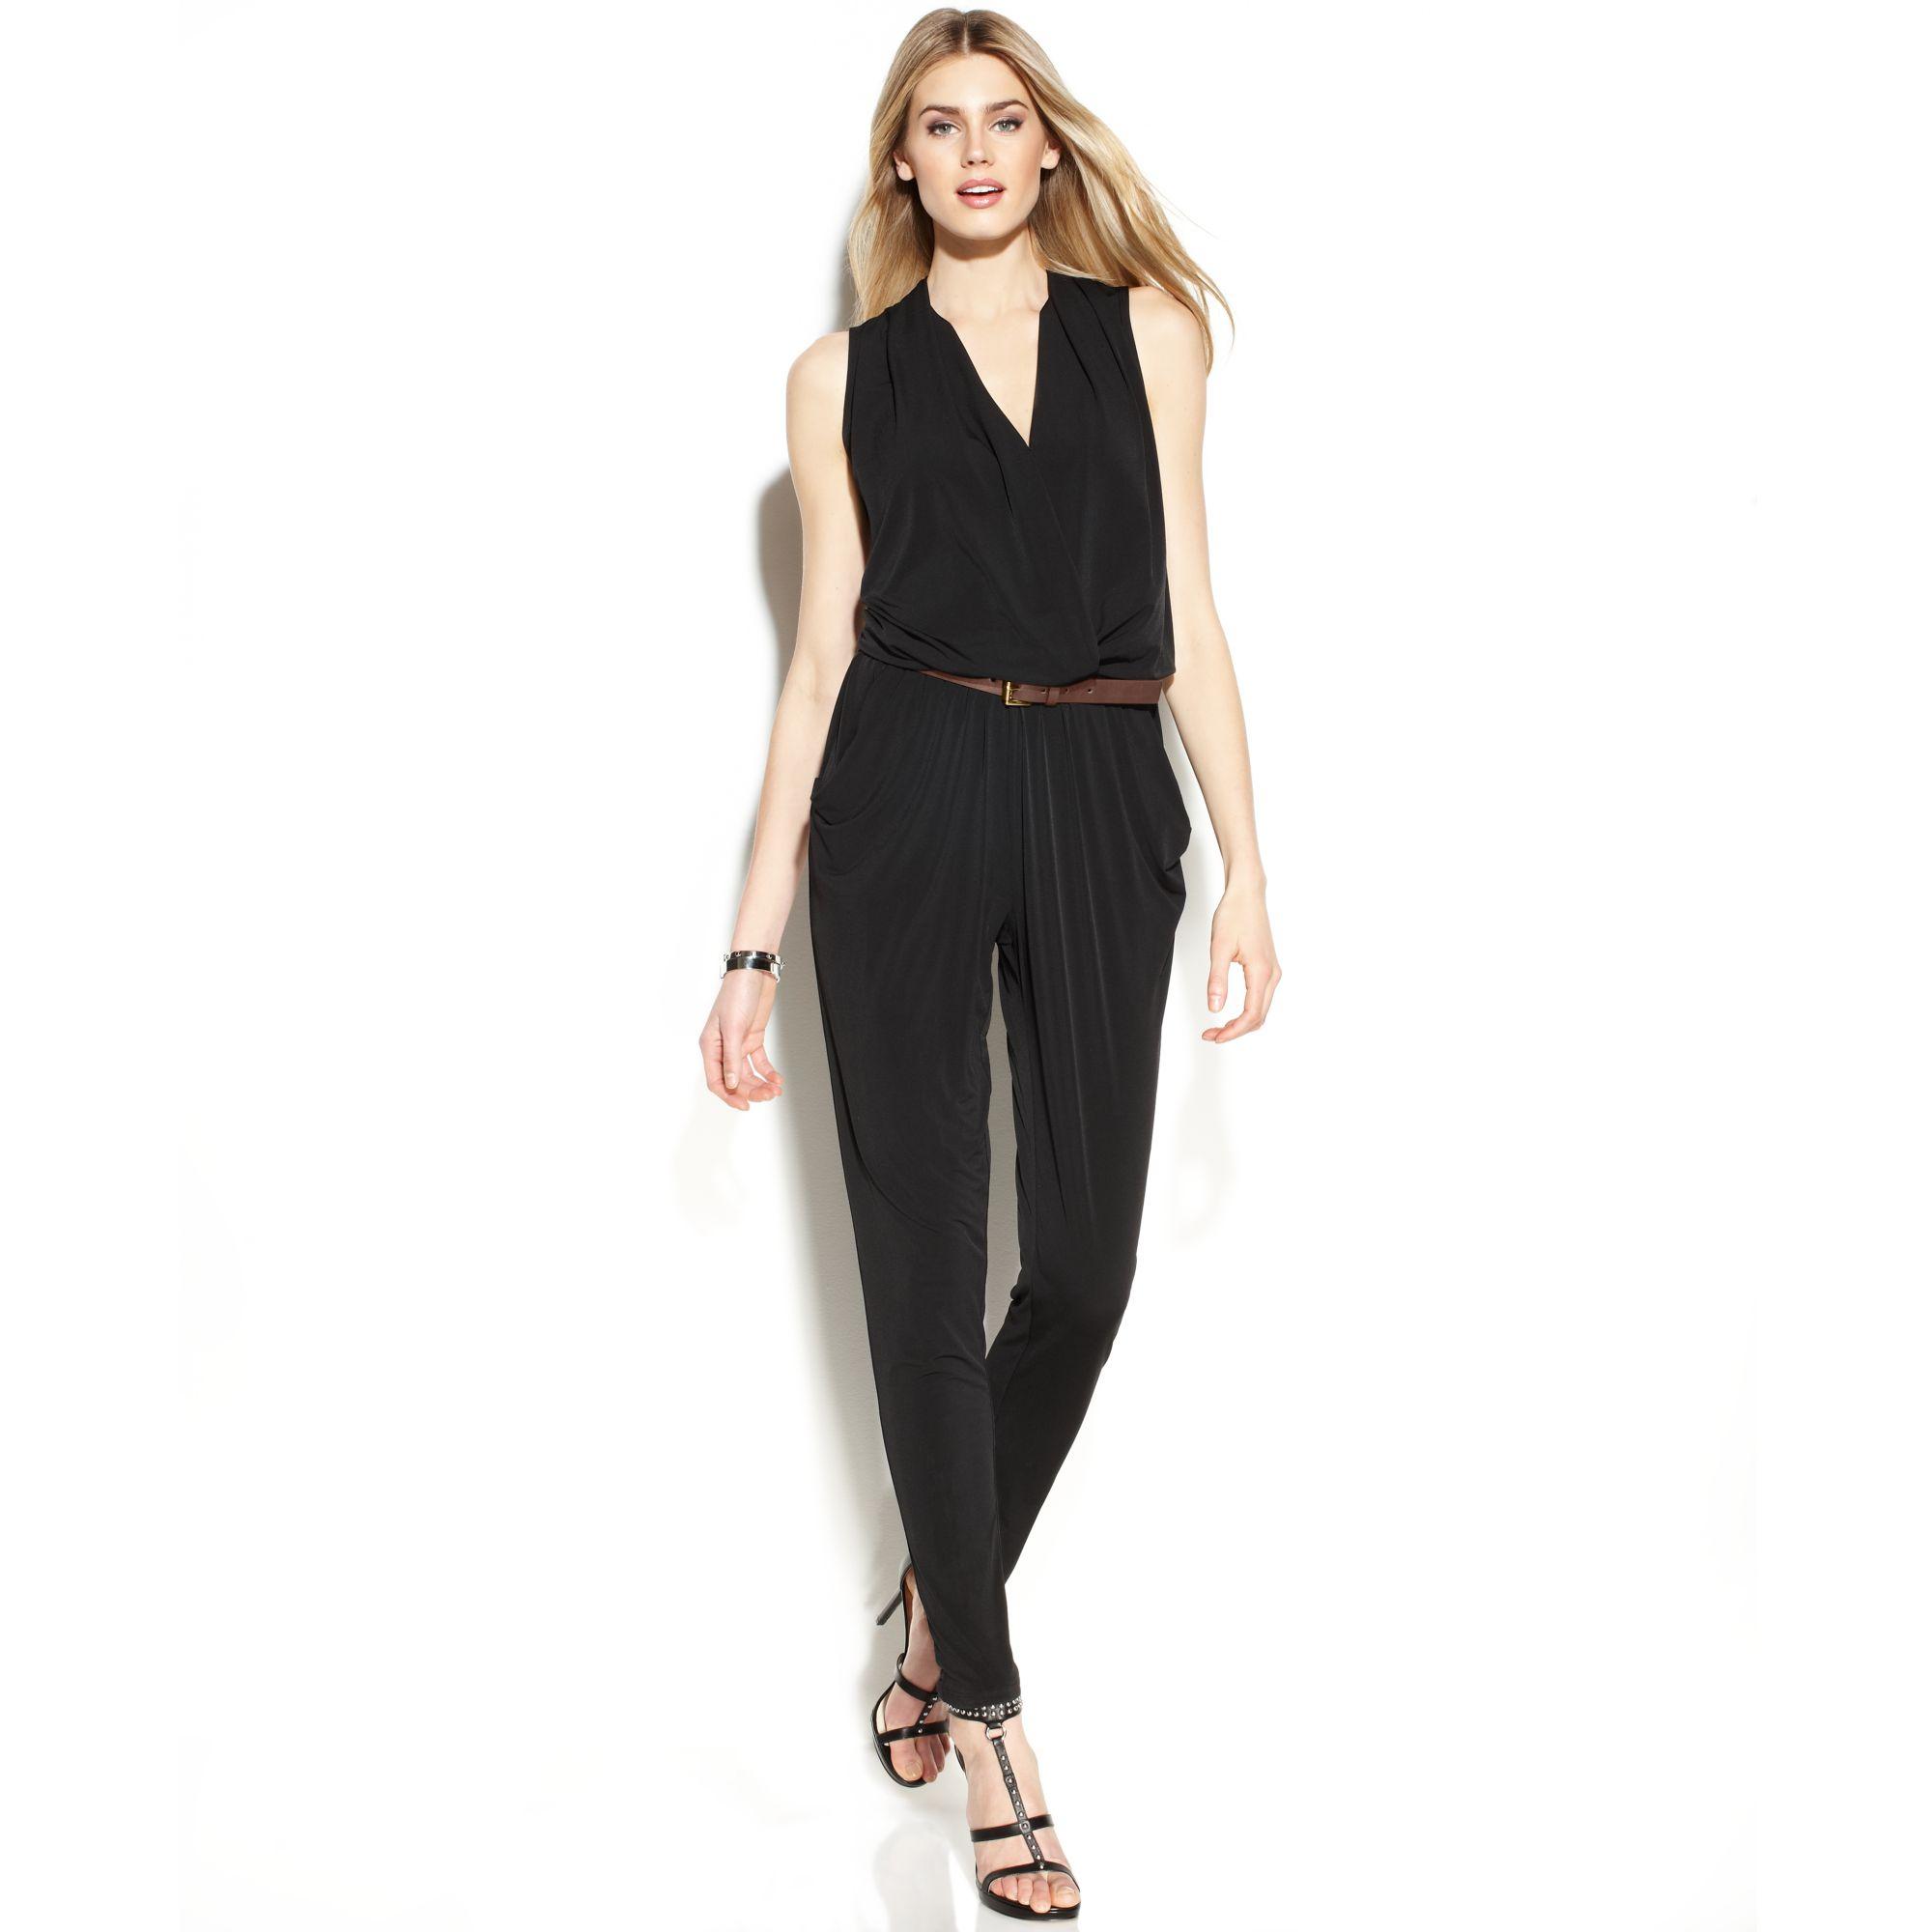 d144b0e2493e Lyst - Michael Kors Michael Sleeveless Belted Jumpsuit in Black